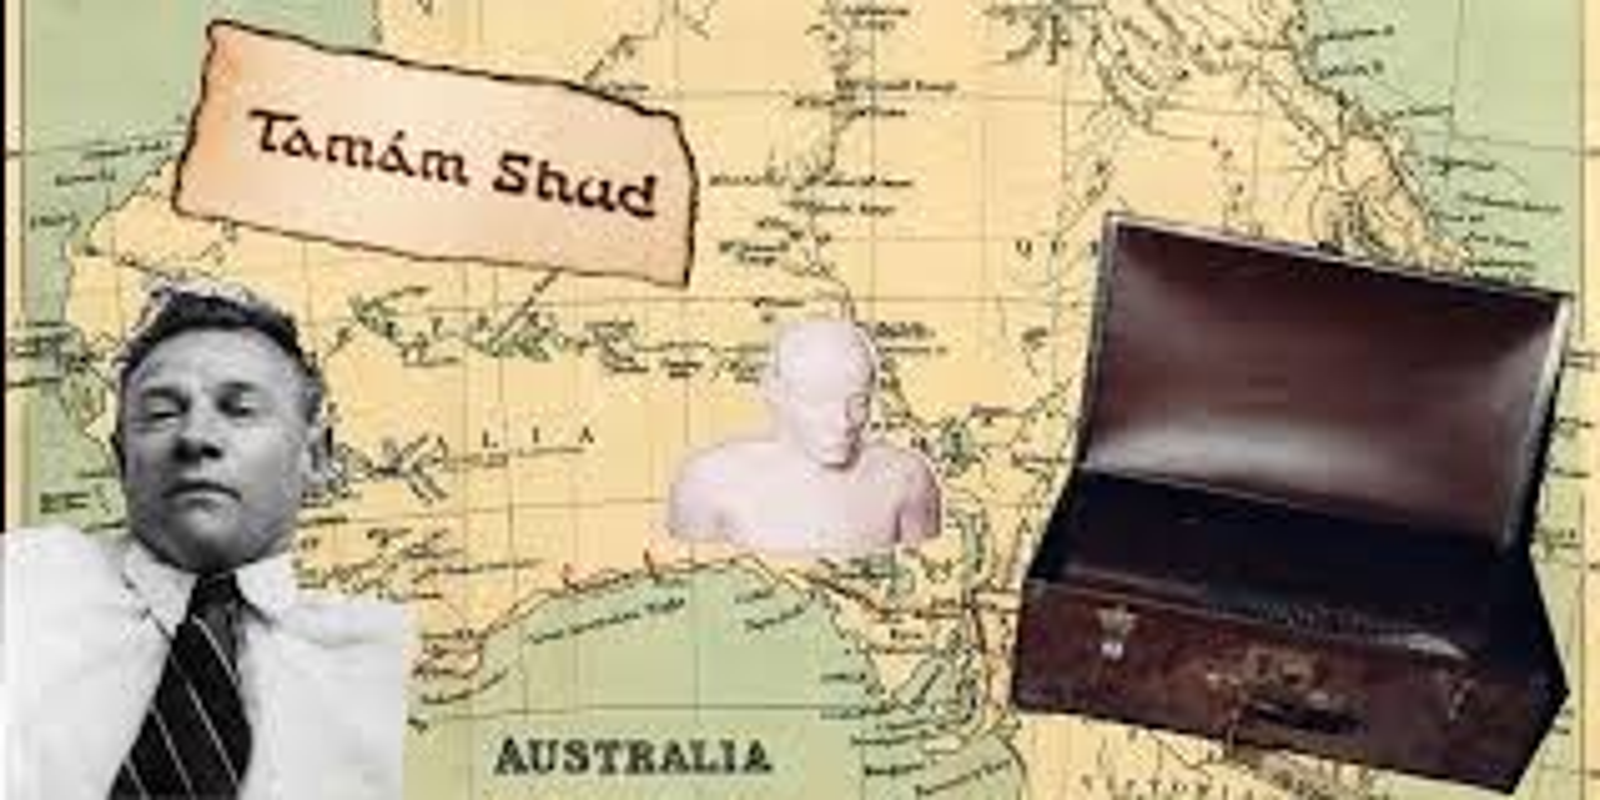 Vu an bi an o Australia 73 nam chua tim ra danh tinh nan nhan-Hinh-10